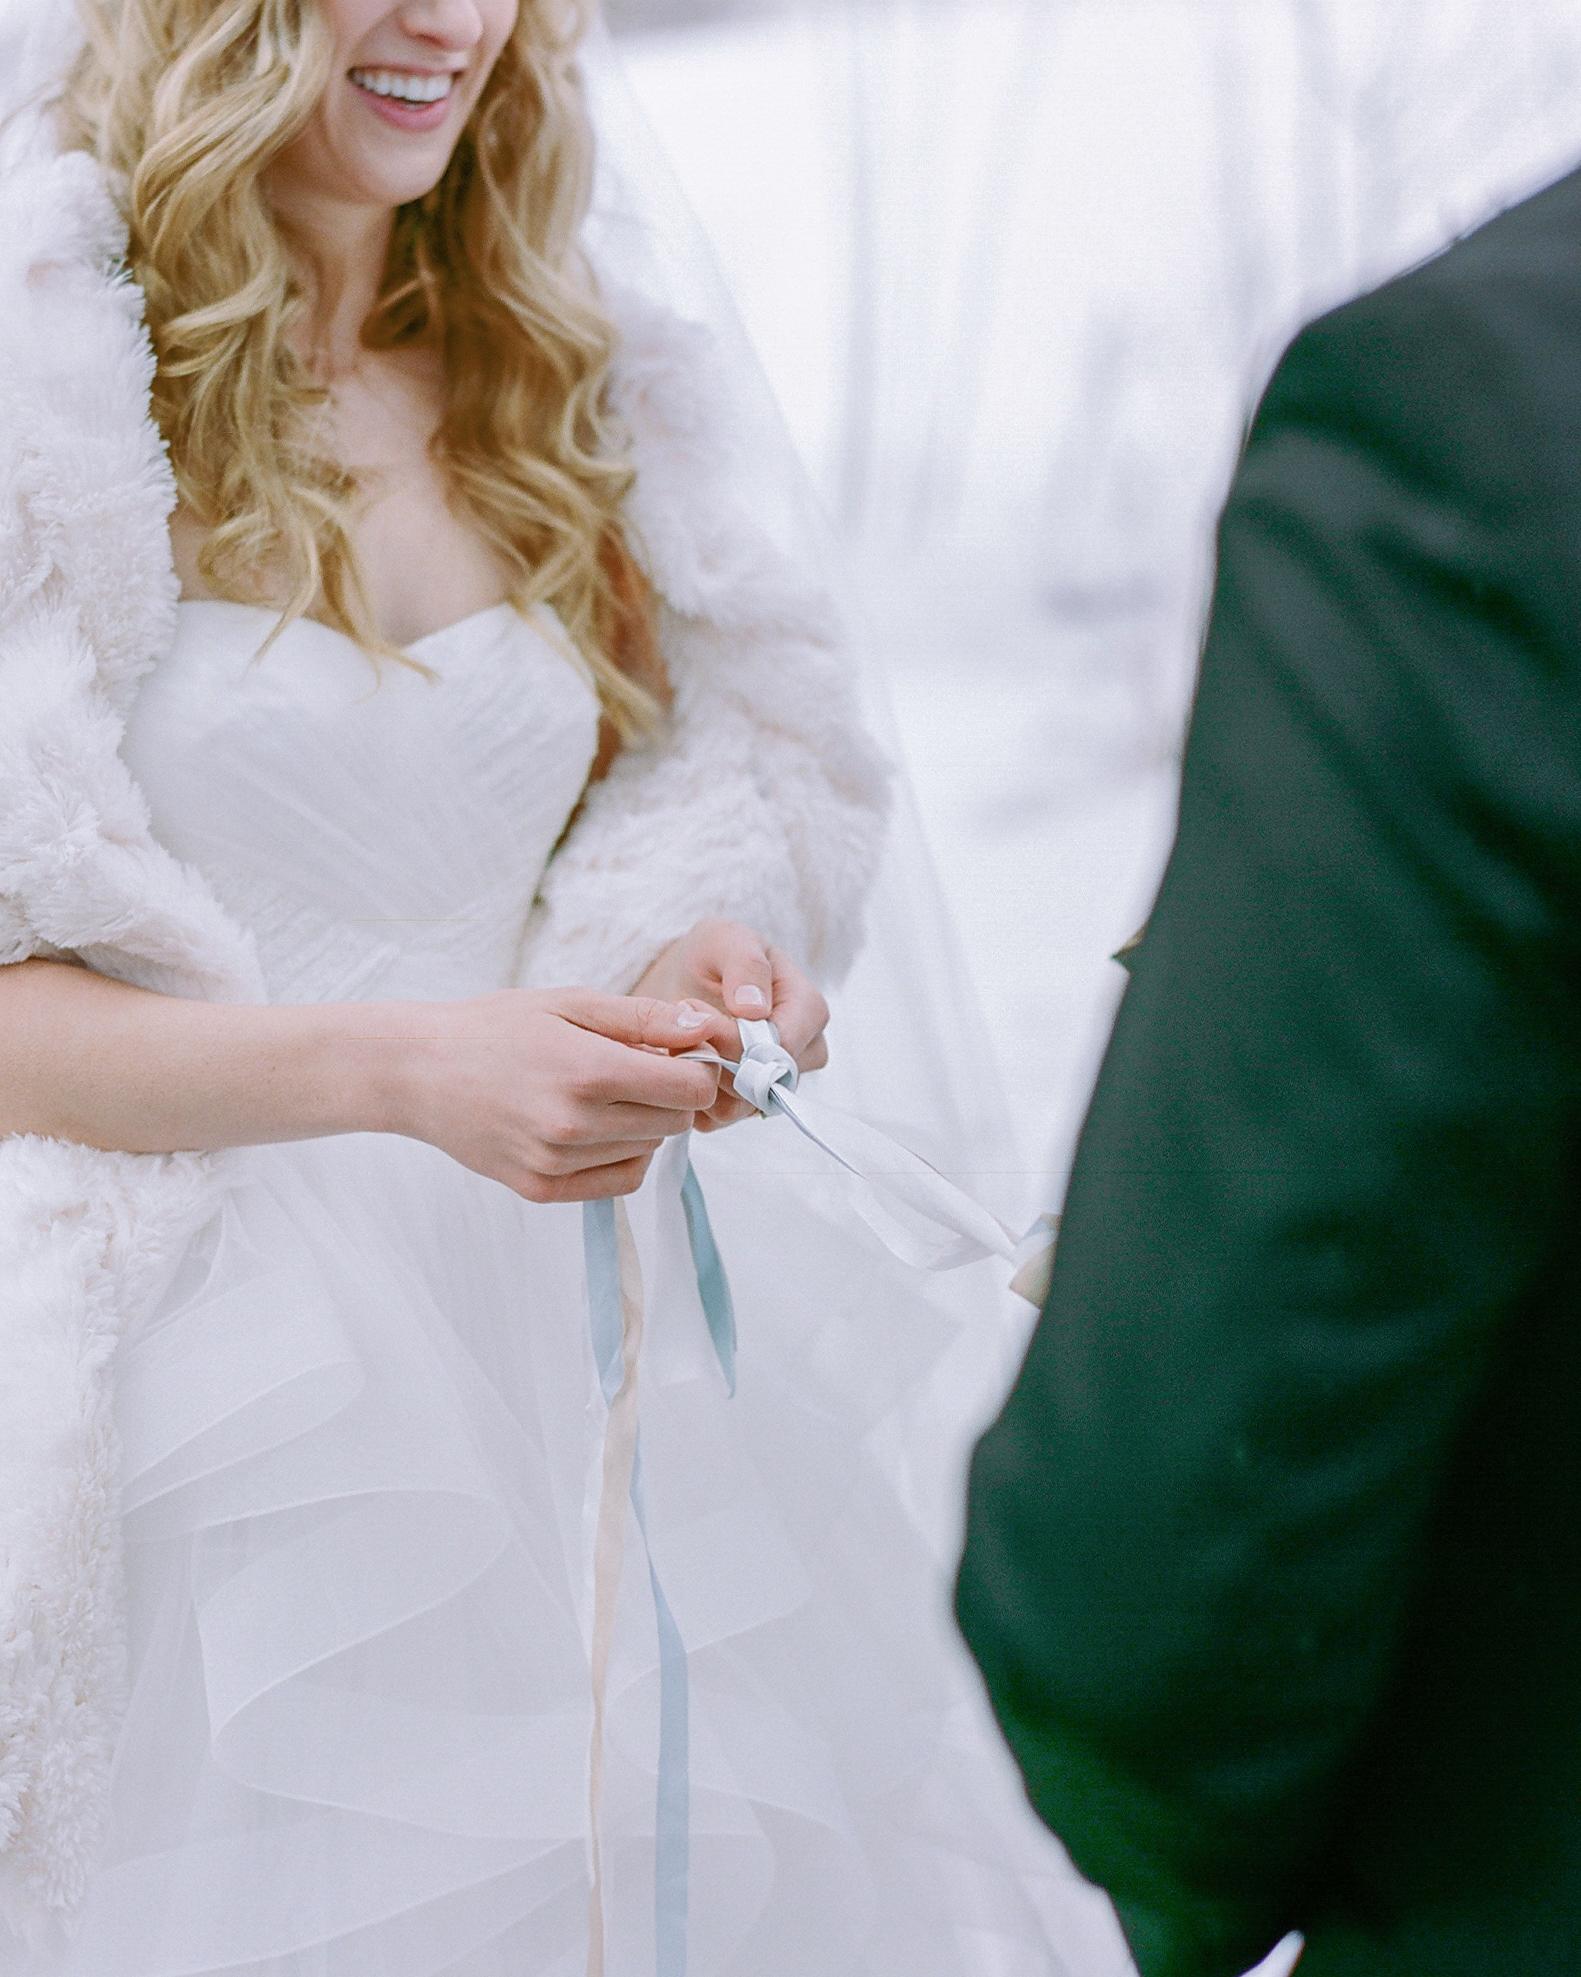 kendall-grant-wedding-knot-088-s112328-1215.jpg